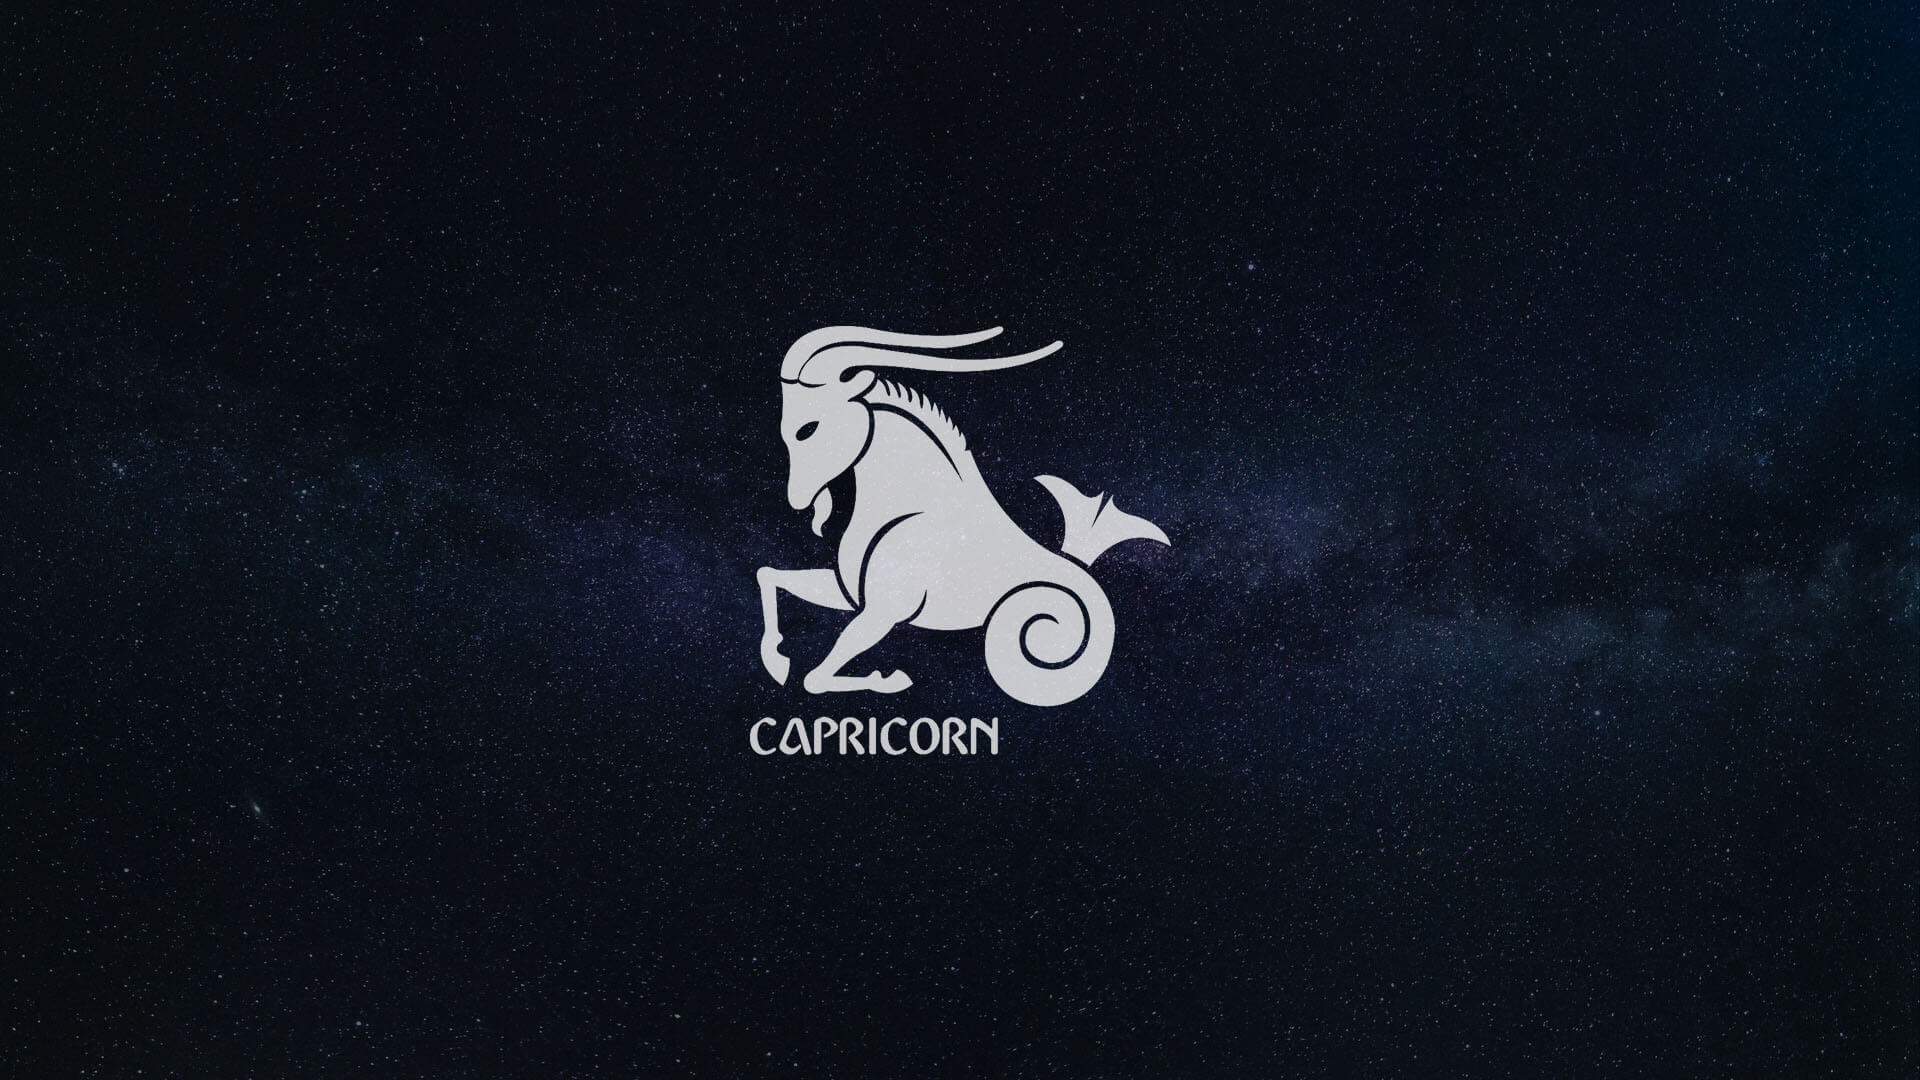 Capricorn Season 2020